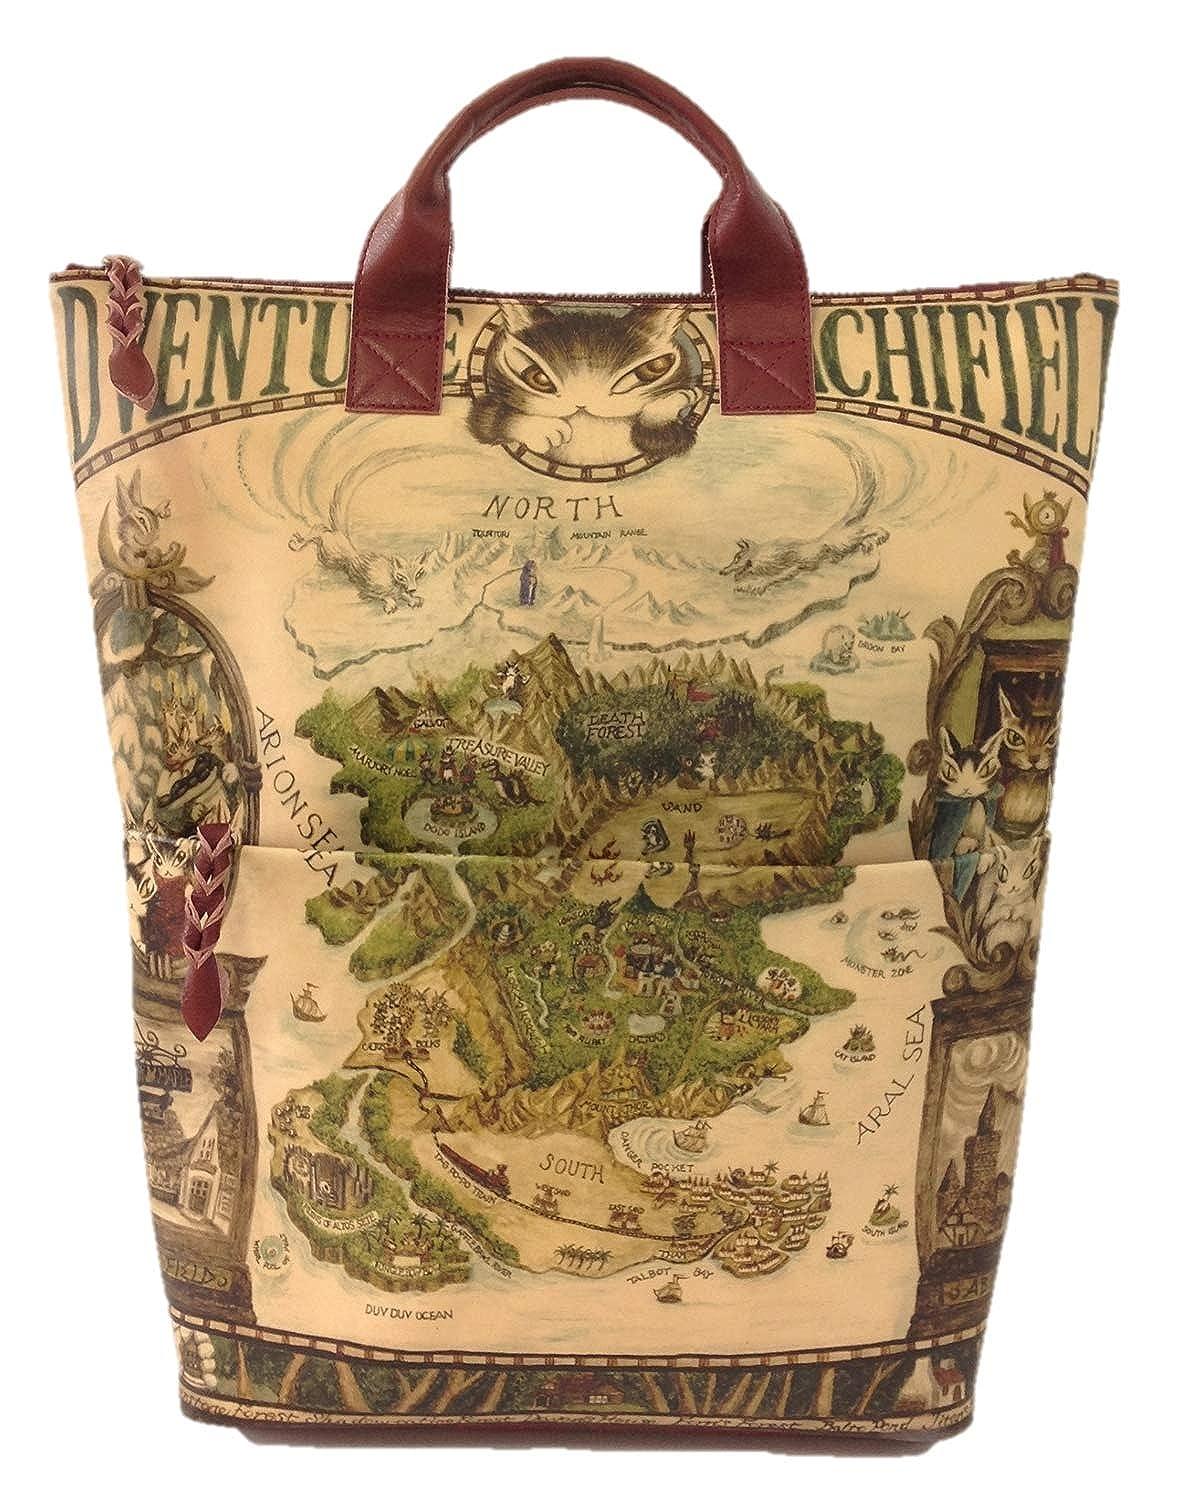 WACHIFIELD [わちふぃーるど] ダヤン 本革 レザーアート リュック 羊皮紙の地図ワイン B07PV6RVGP